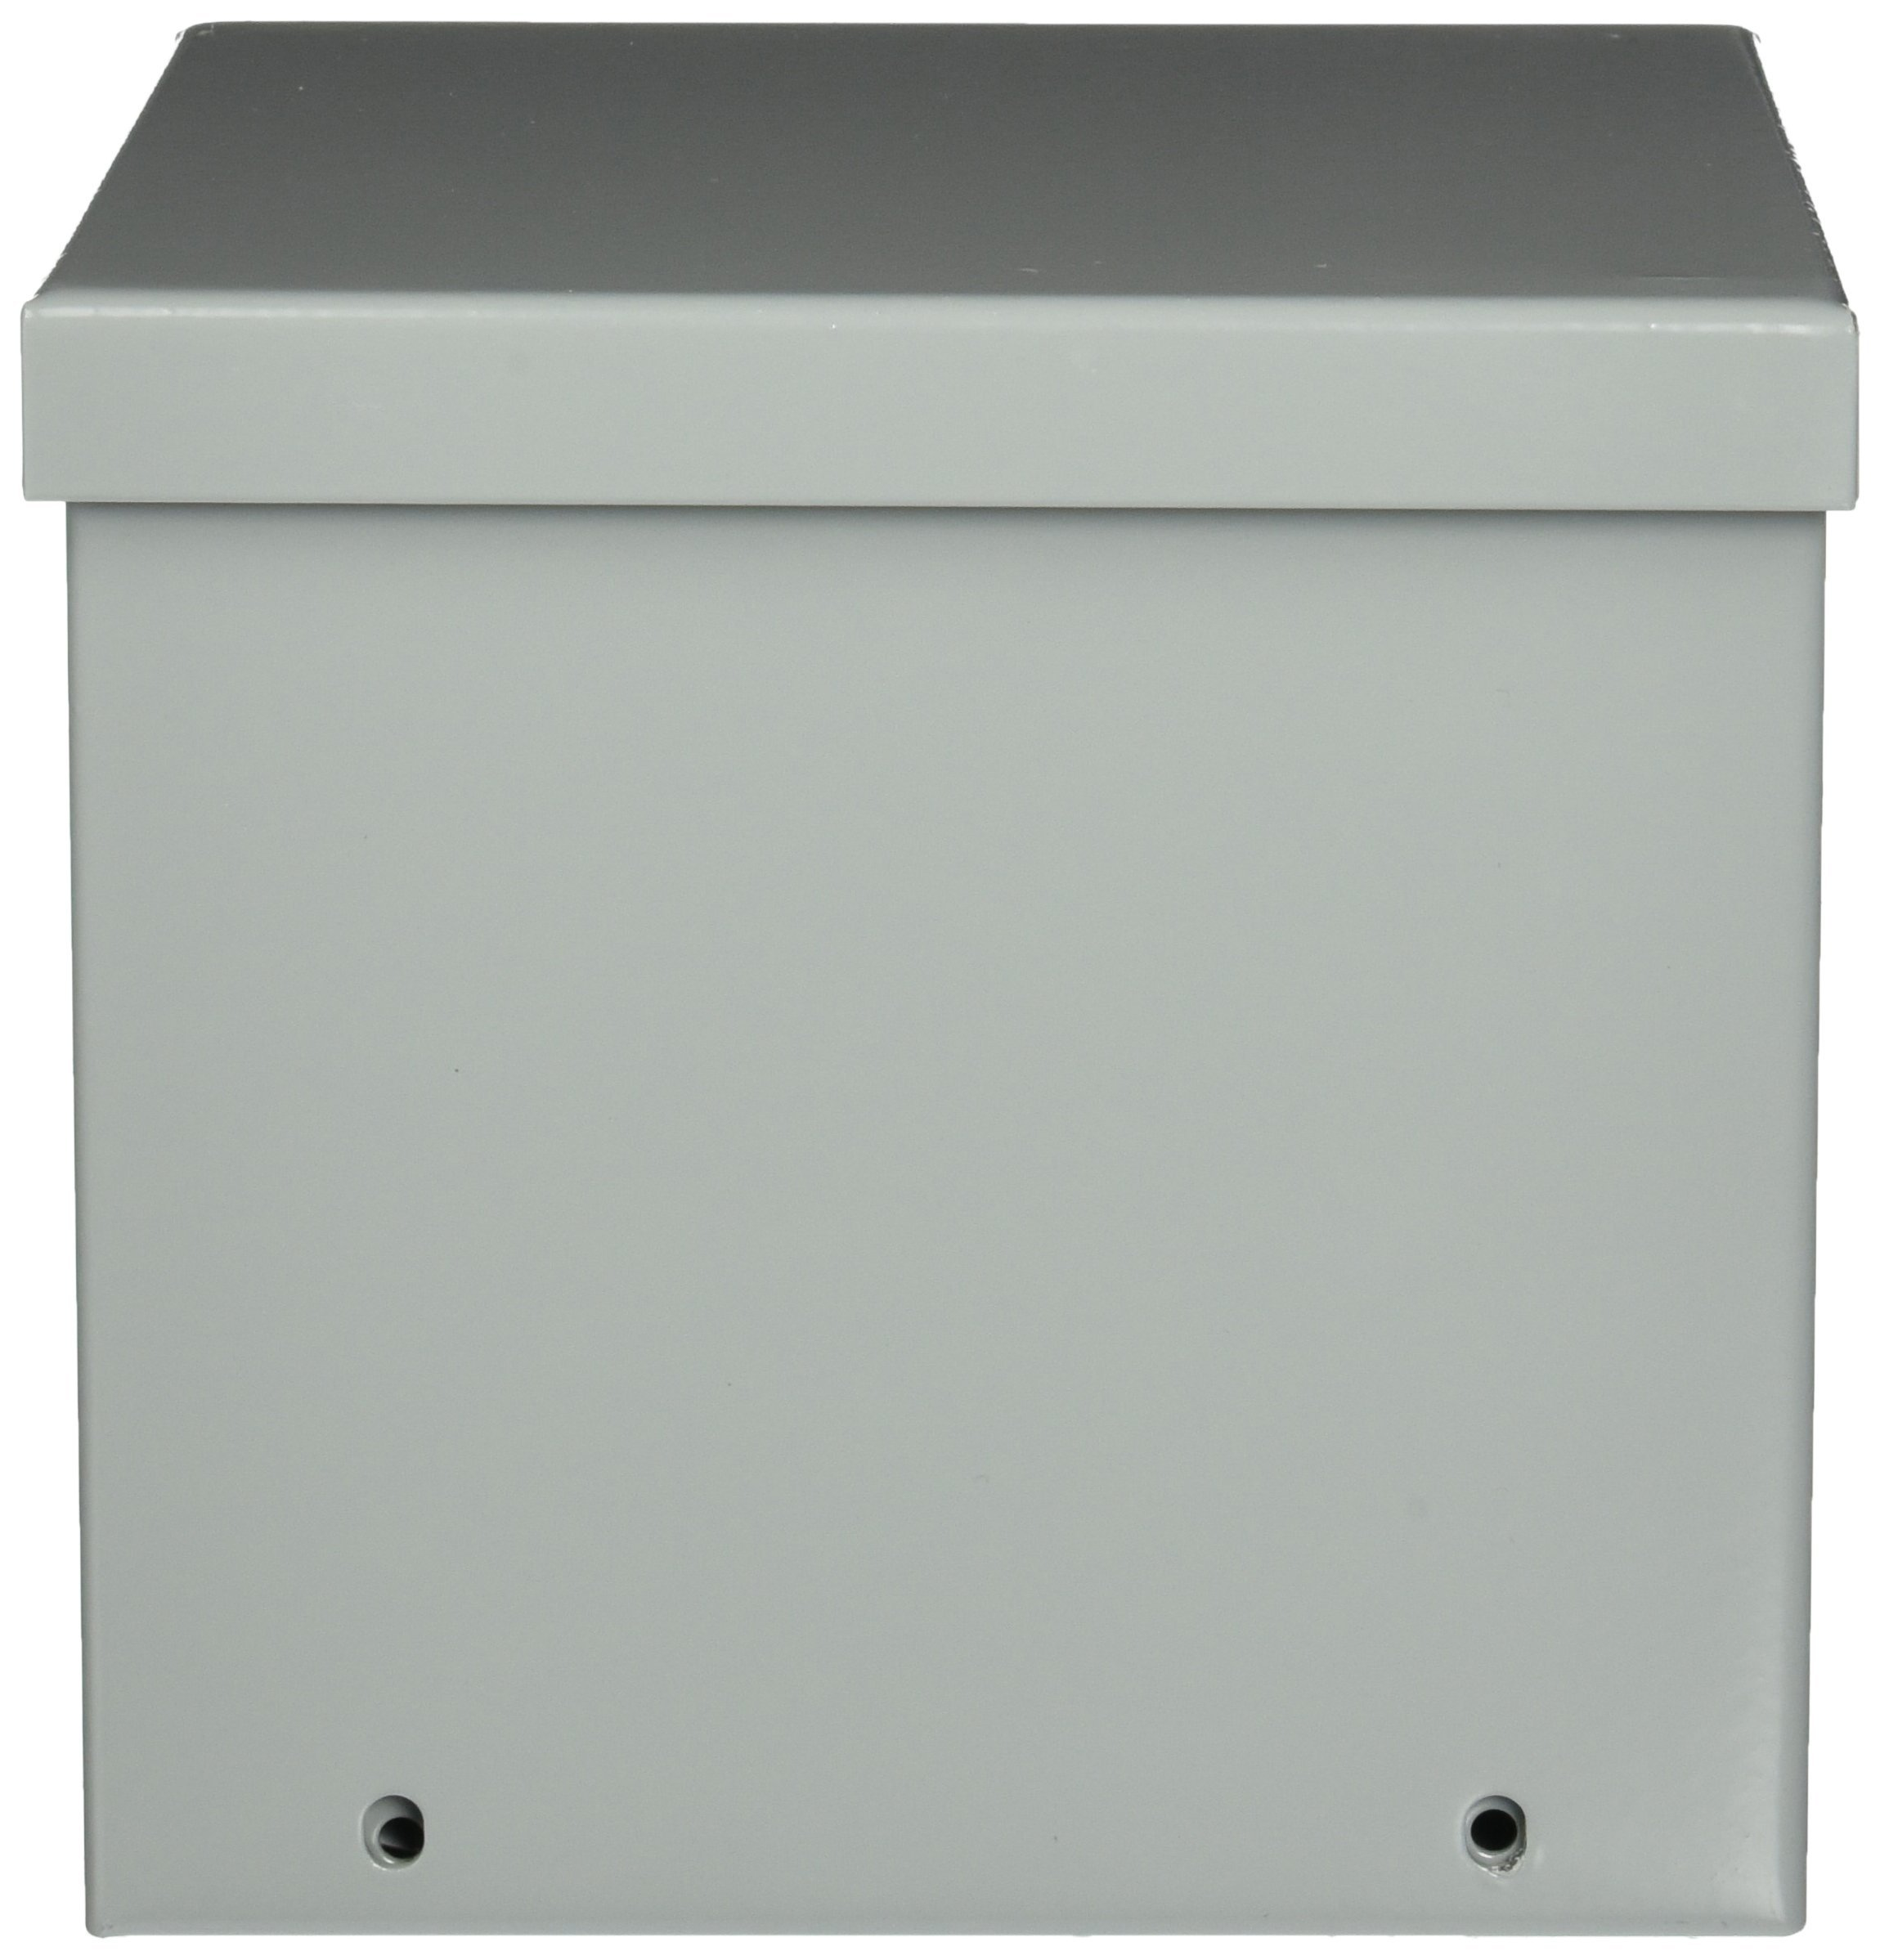 Hoffman A6R66 NEMA 3R Enclosure, Screw Cover, Galvanized, Paint Finish, 6'' x 6'' x 6''